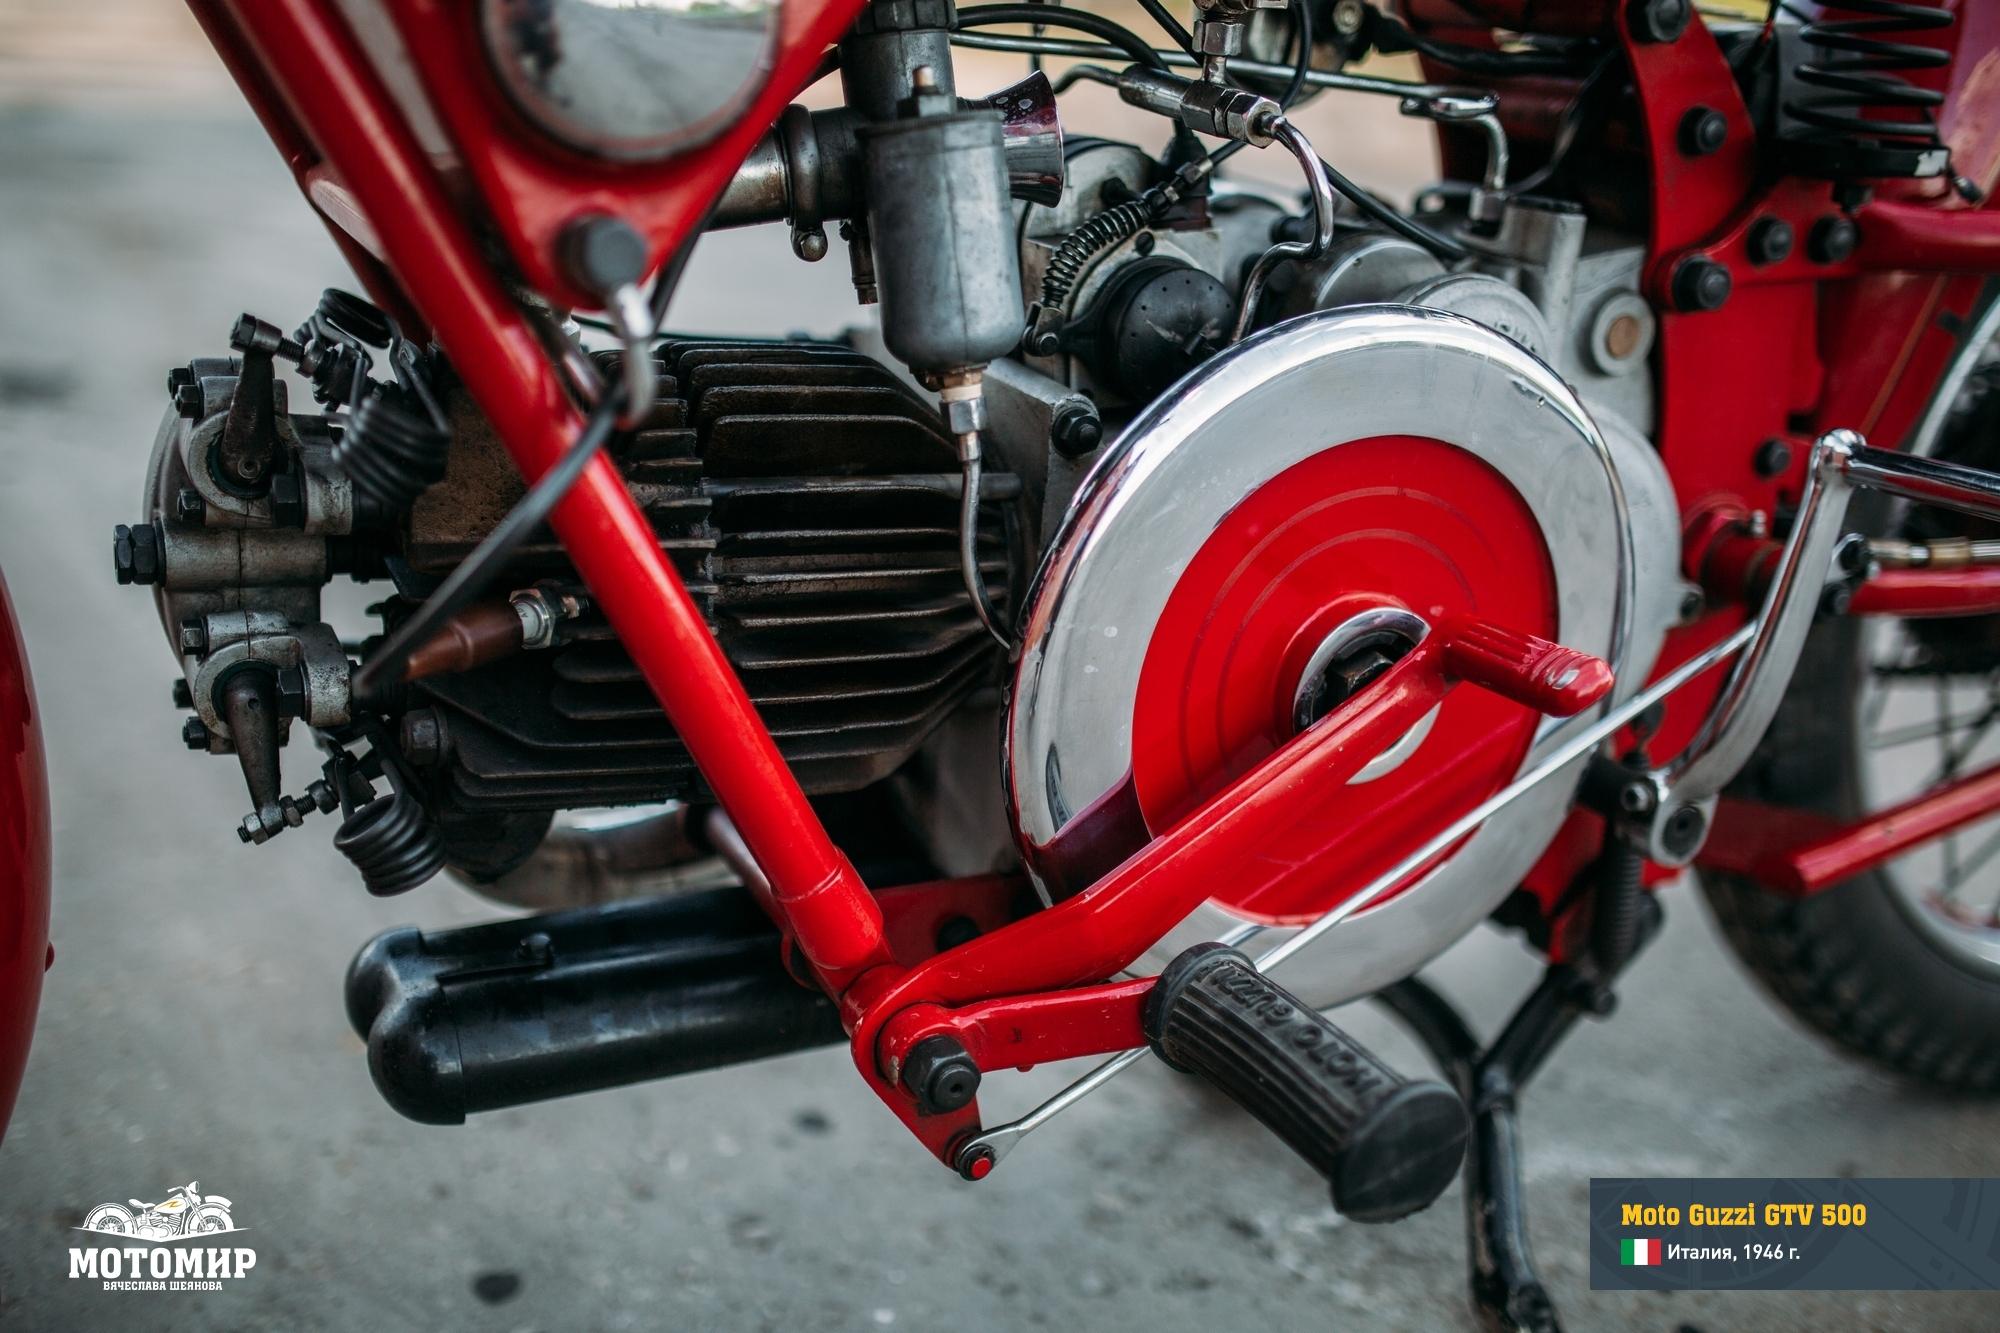 moto-guzzi-gtv-500-201509-web-32